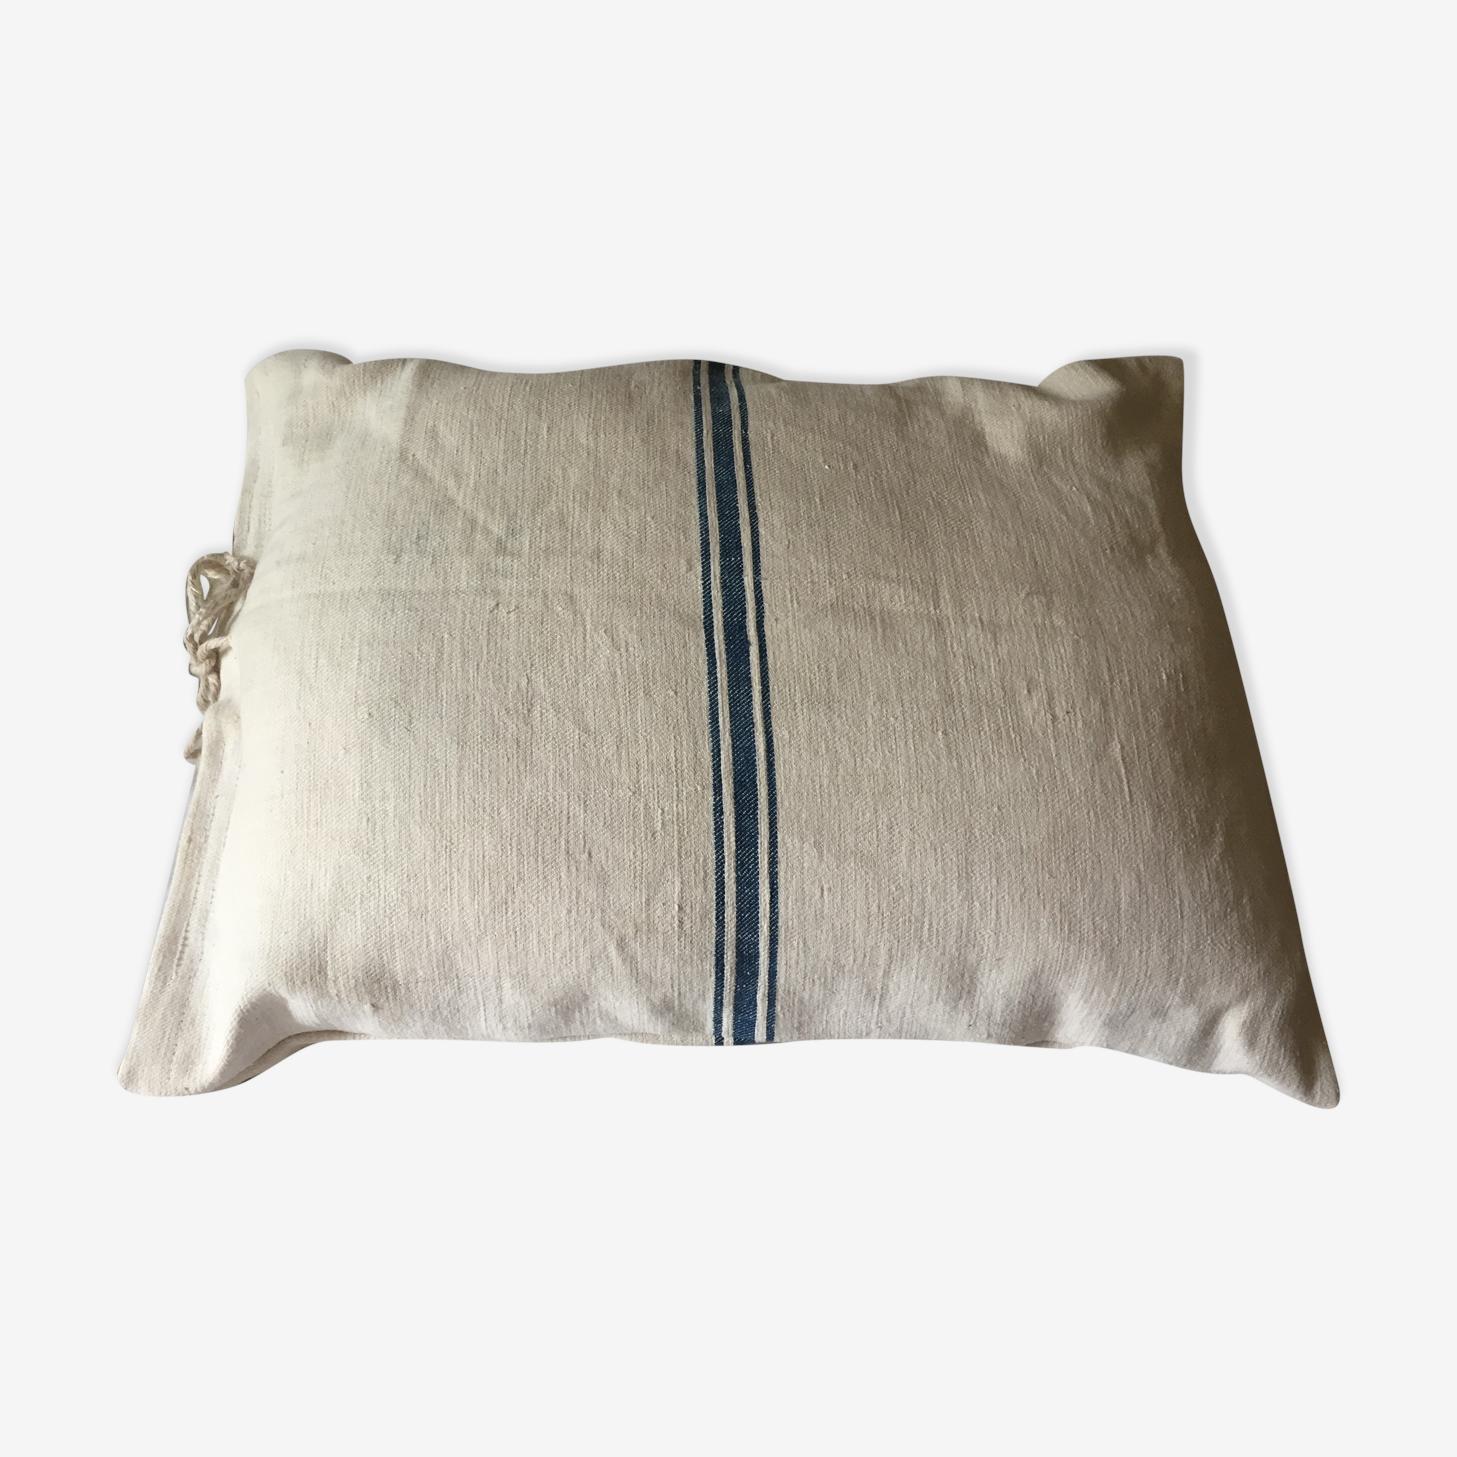 Cushions in hemp